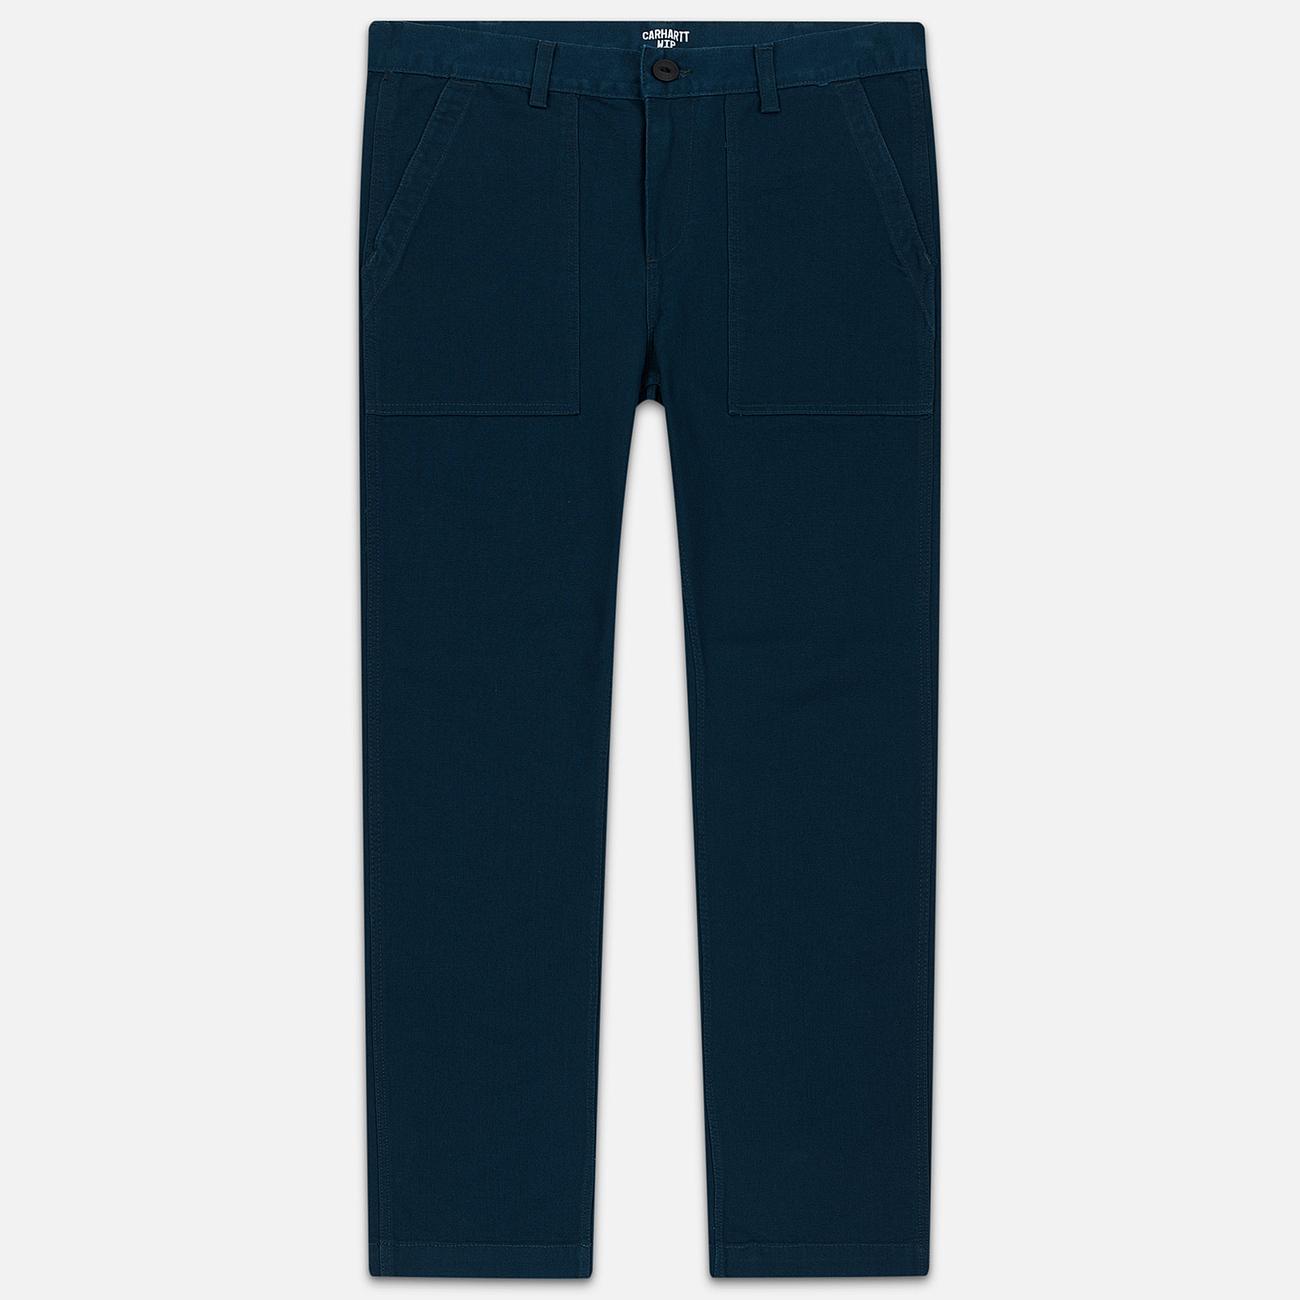 Мужские брюки Carhartt WIP Fatigue 12 Oz Duck Blue Rinsed